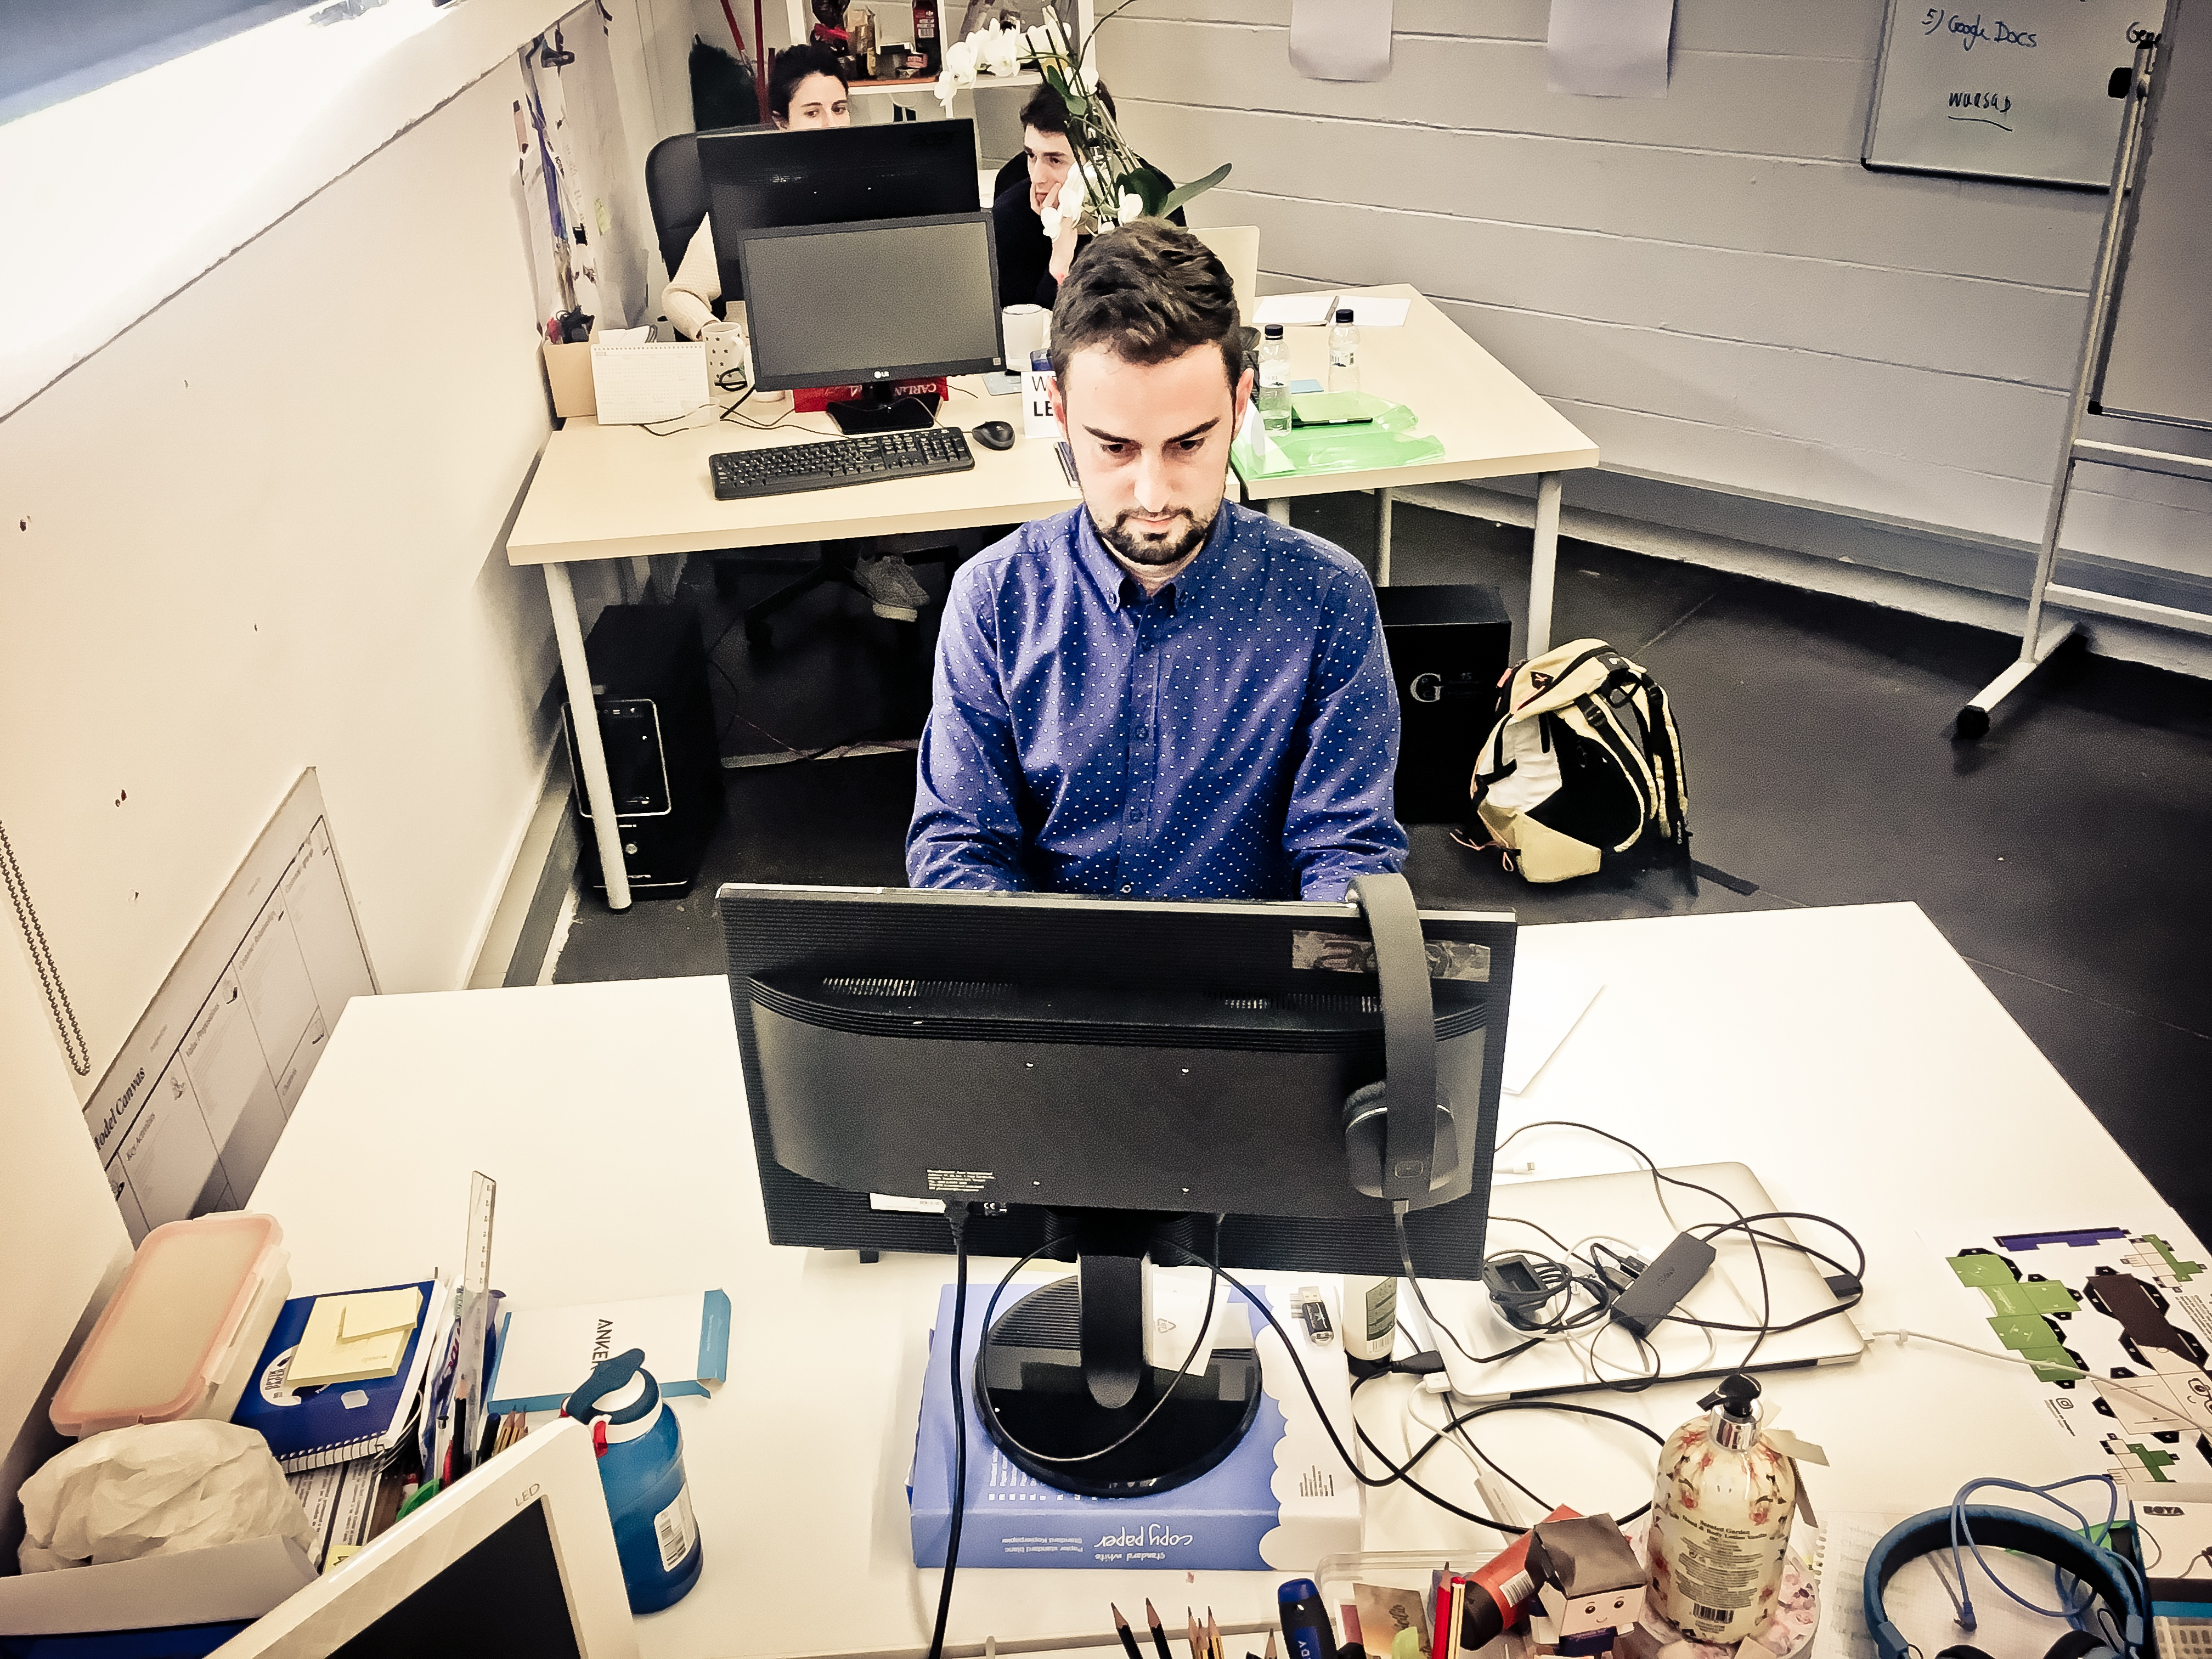 Signaturit_Fran Ballester at work.jpg